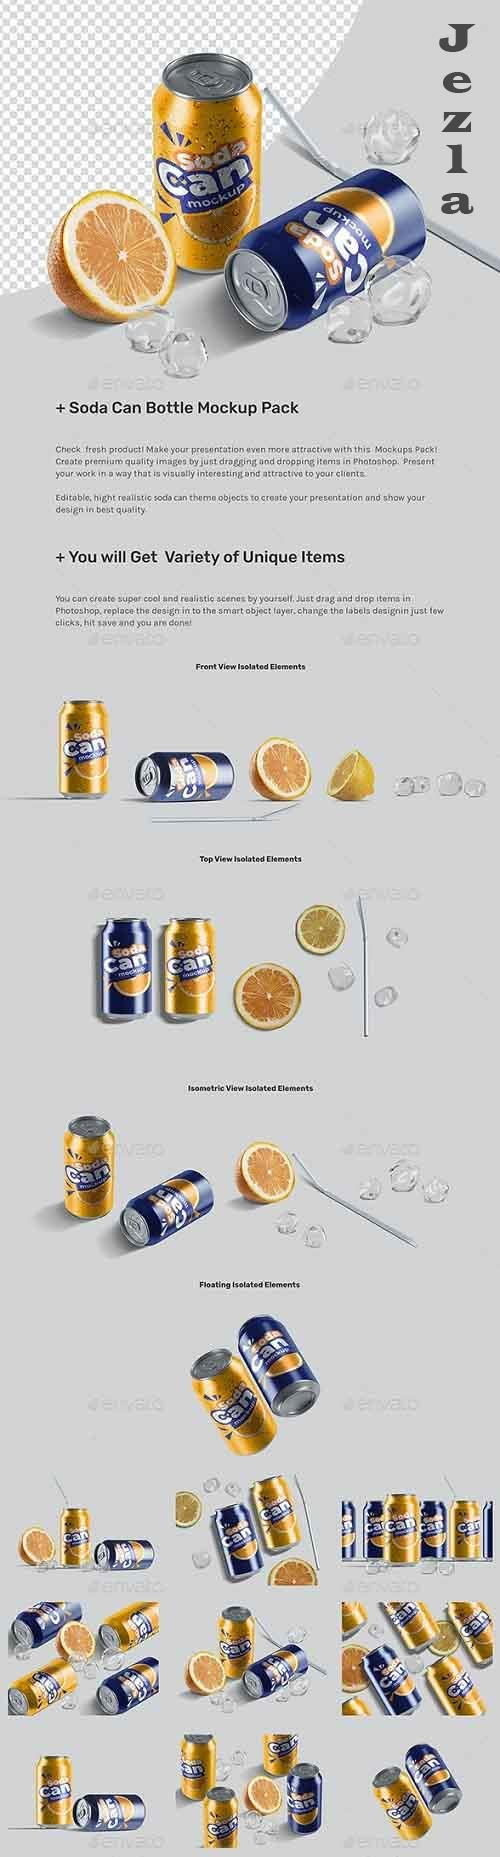 Soda Can Mockup Pack 26857279